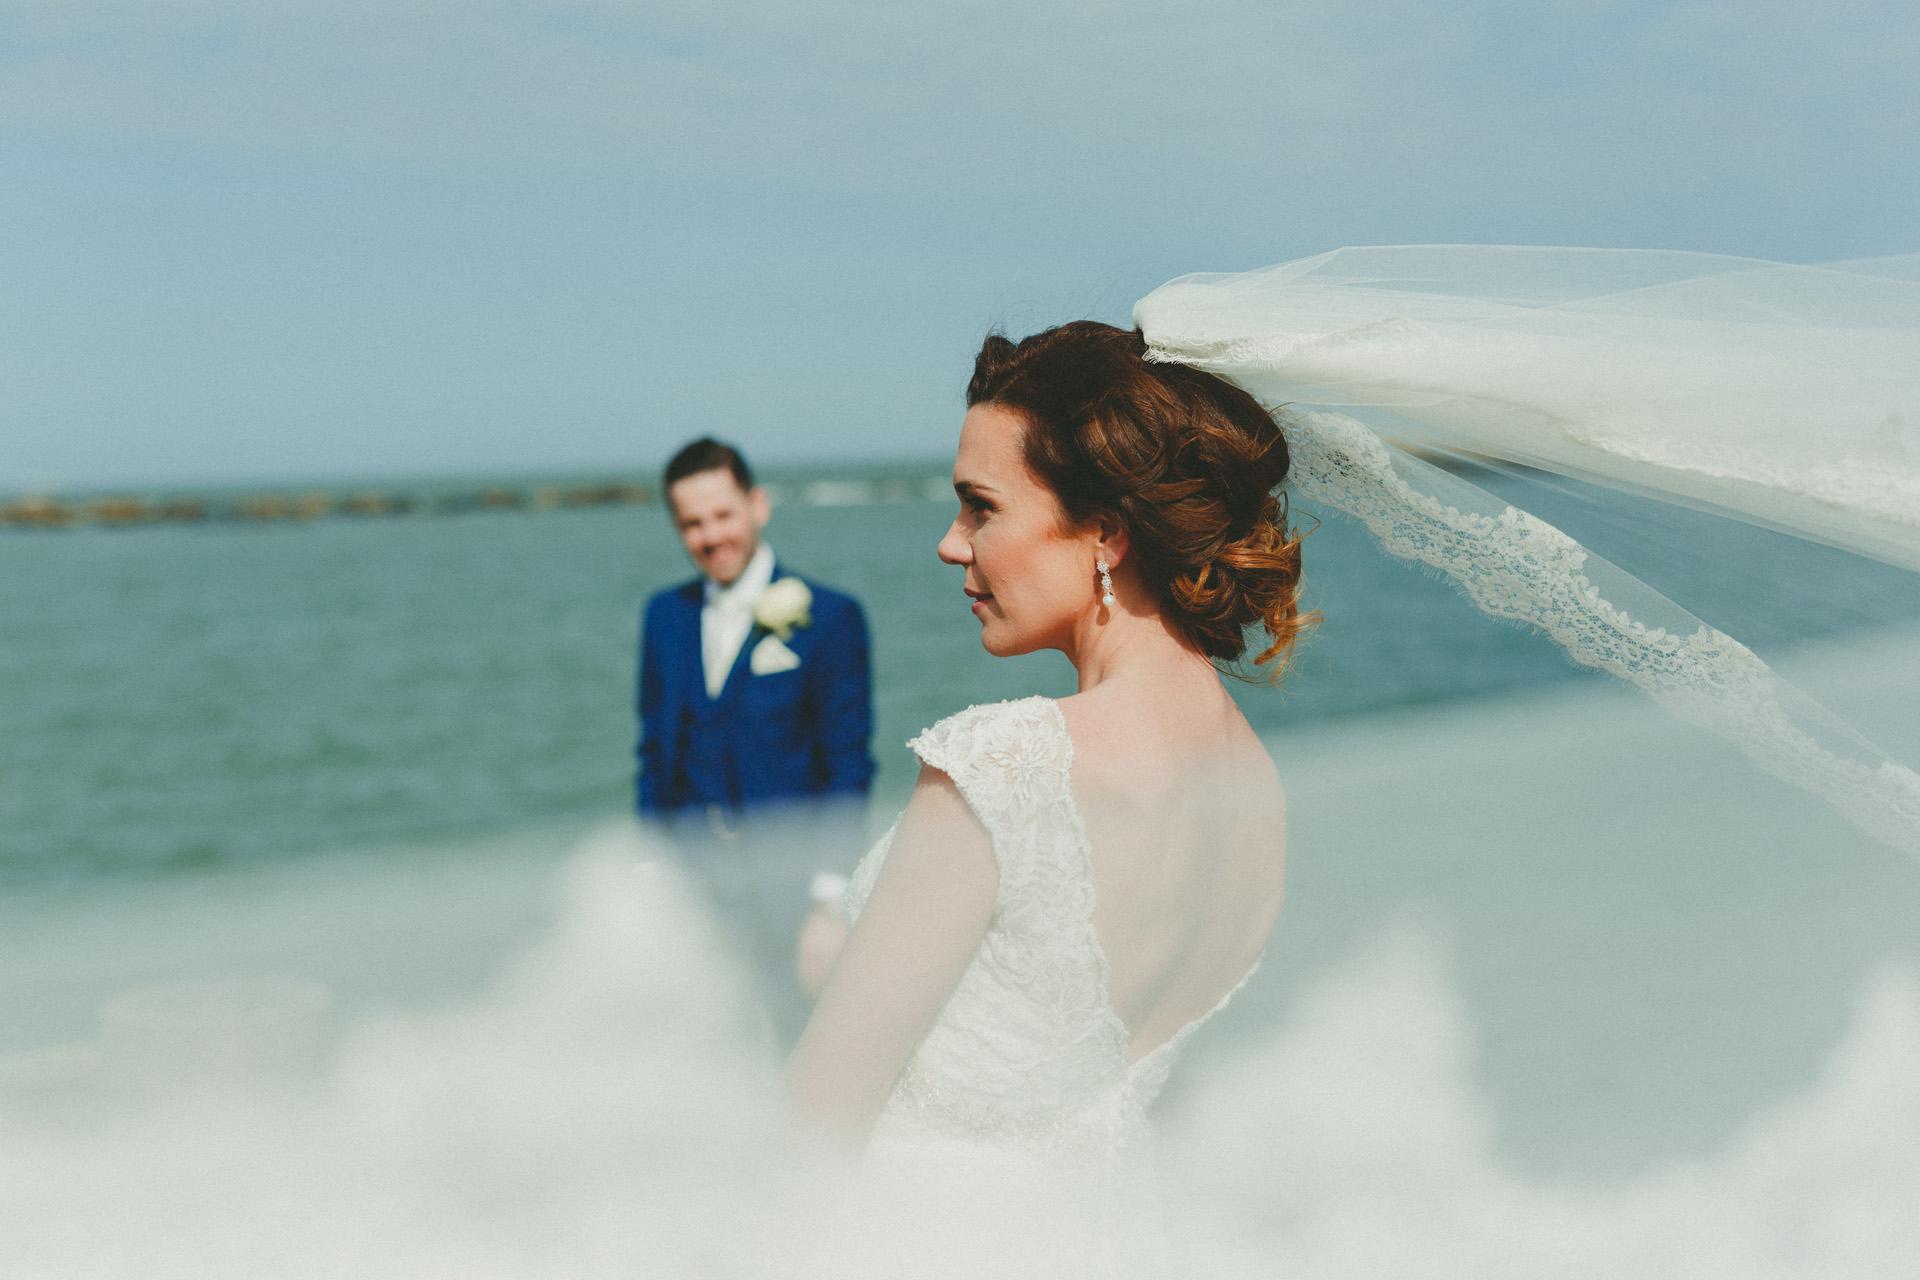 Royal-marine-hotel-wedding-photos